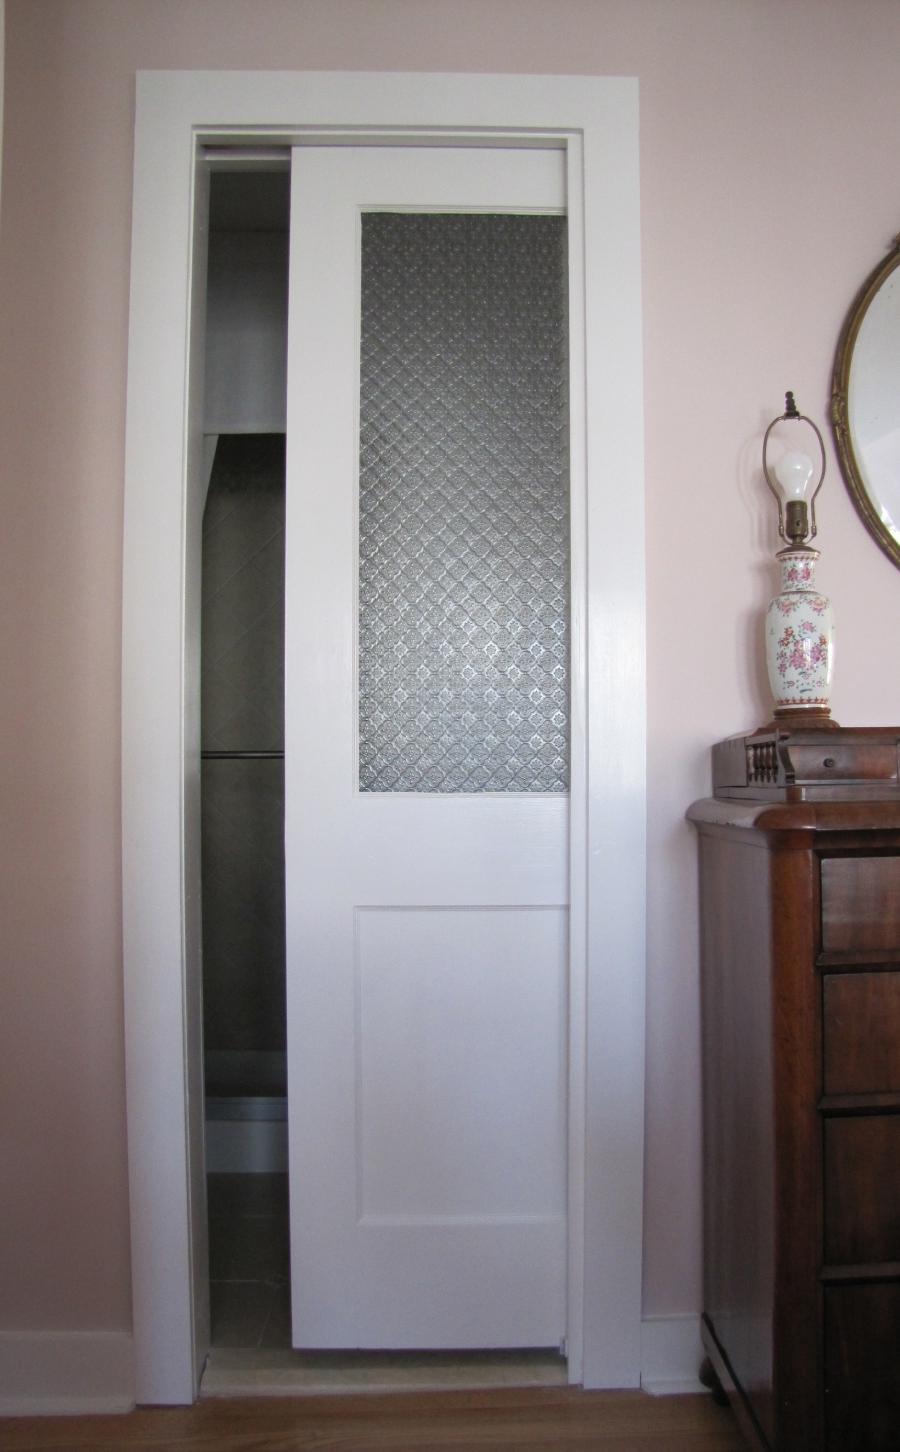 Show me photos of pocket doors for bathrooms